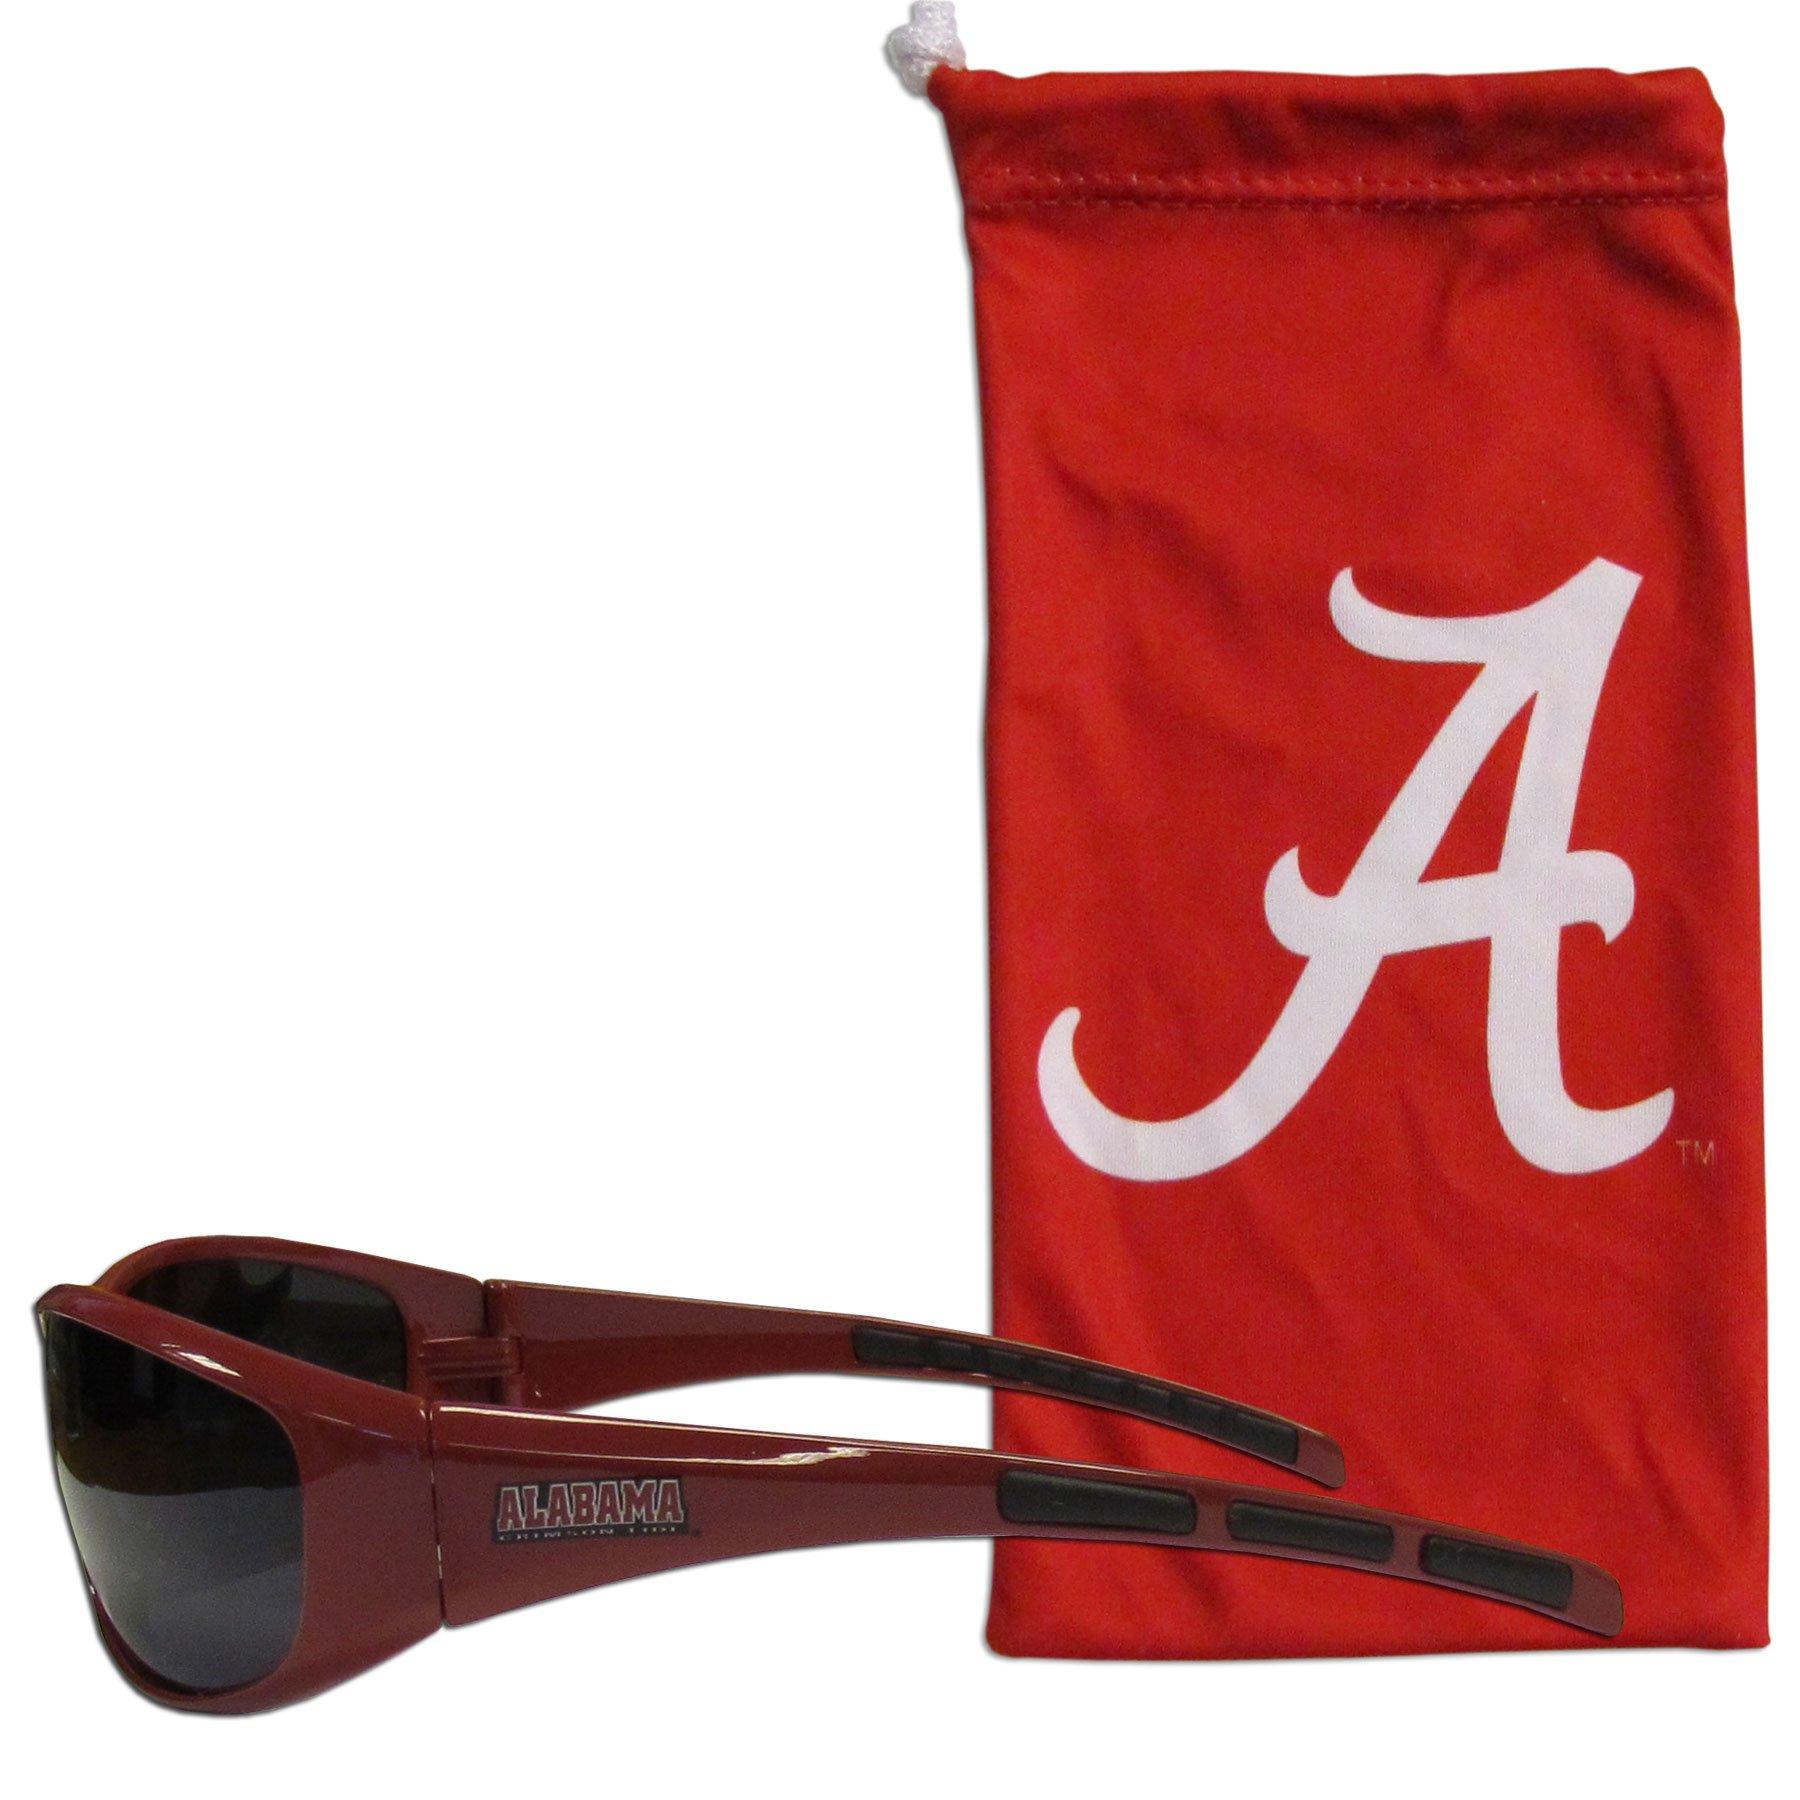 Siskiyou NCAA Alabama Crimson Tide Adult Sunglass and Bag Set, Red